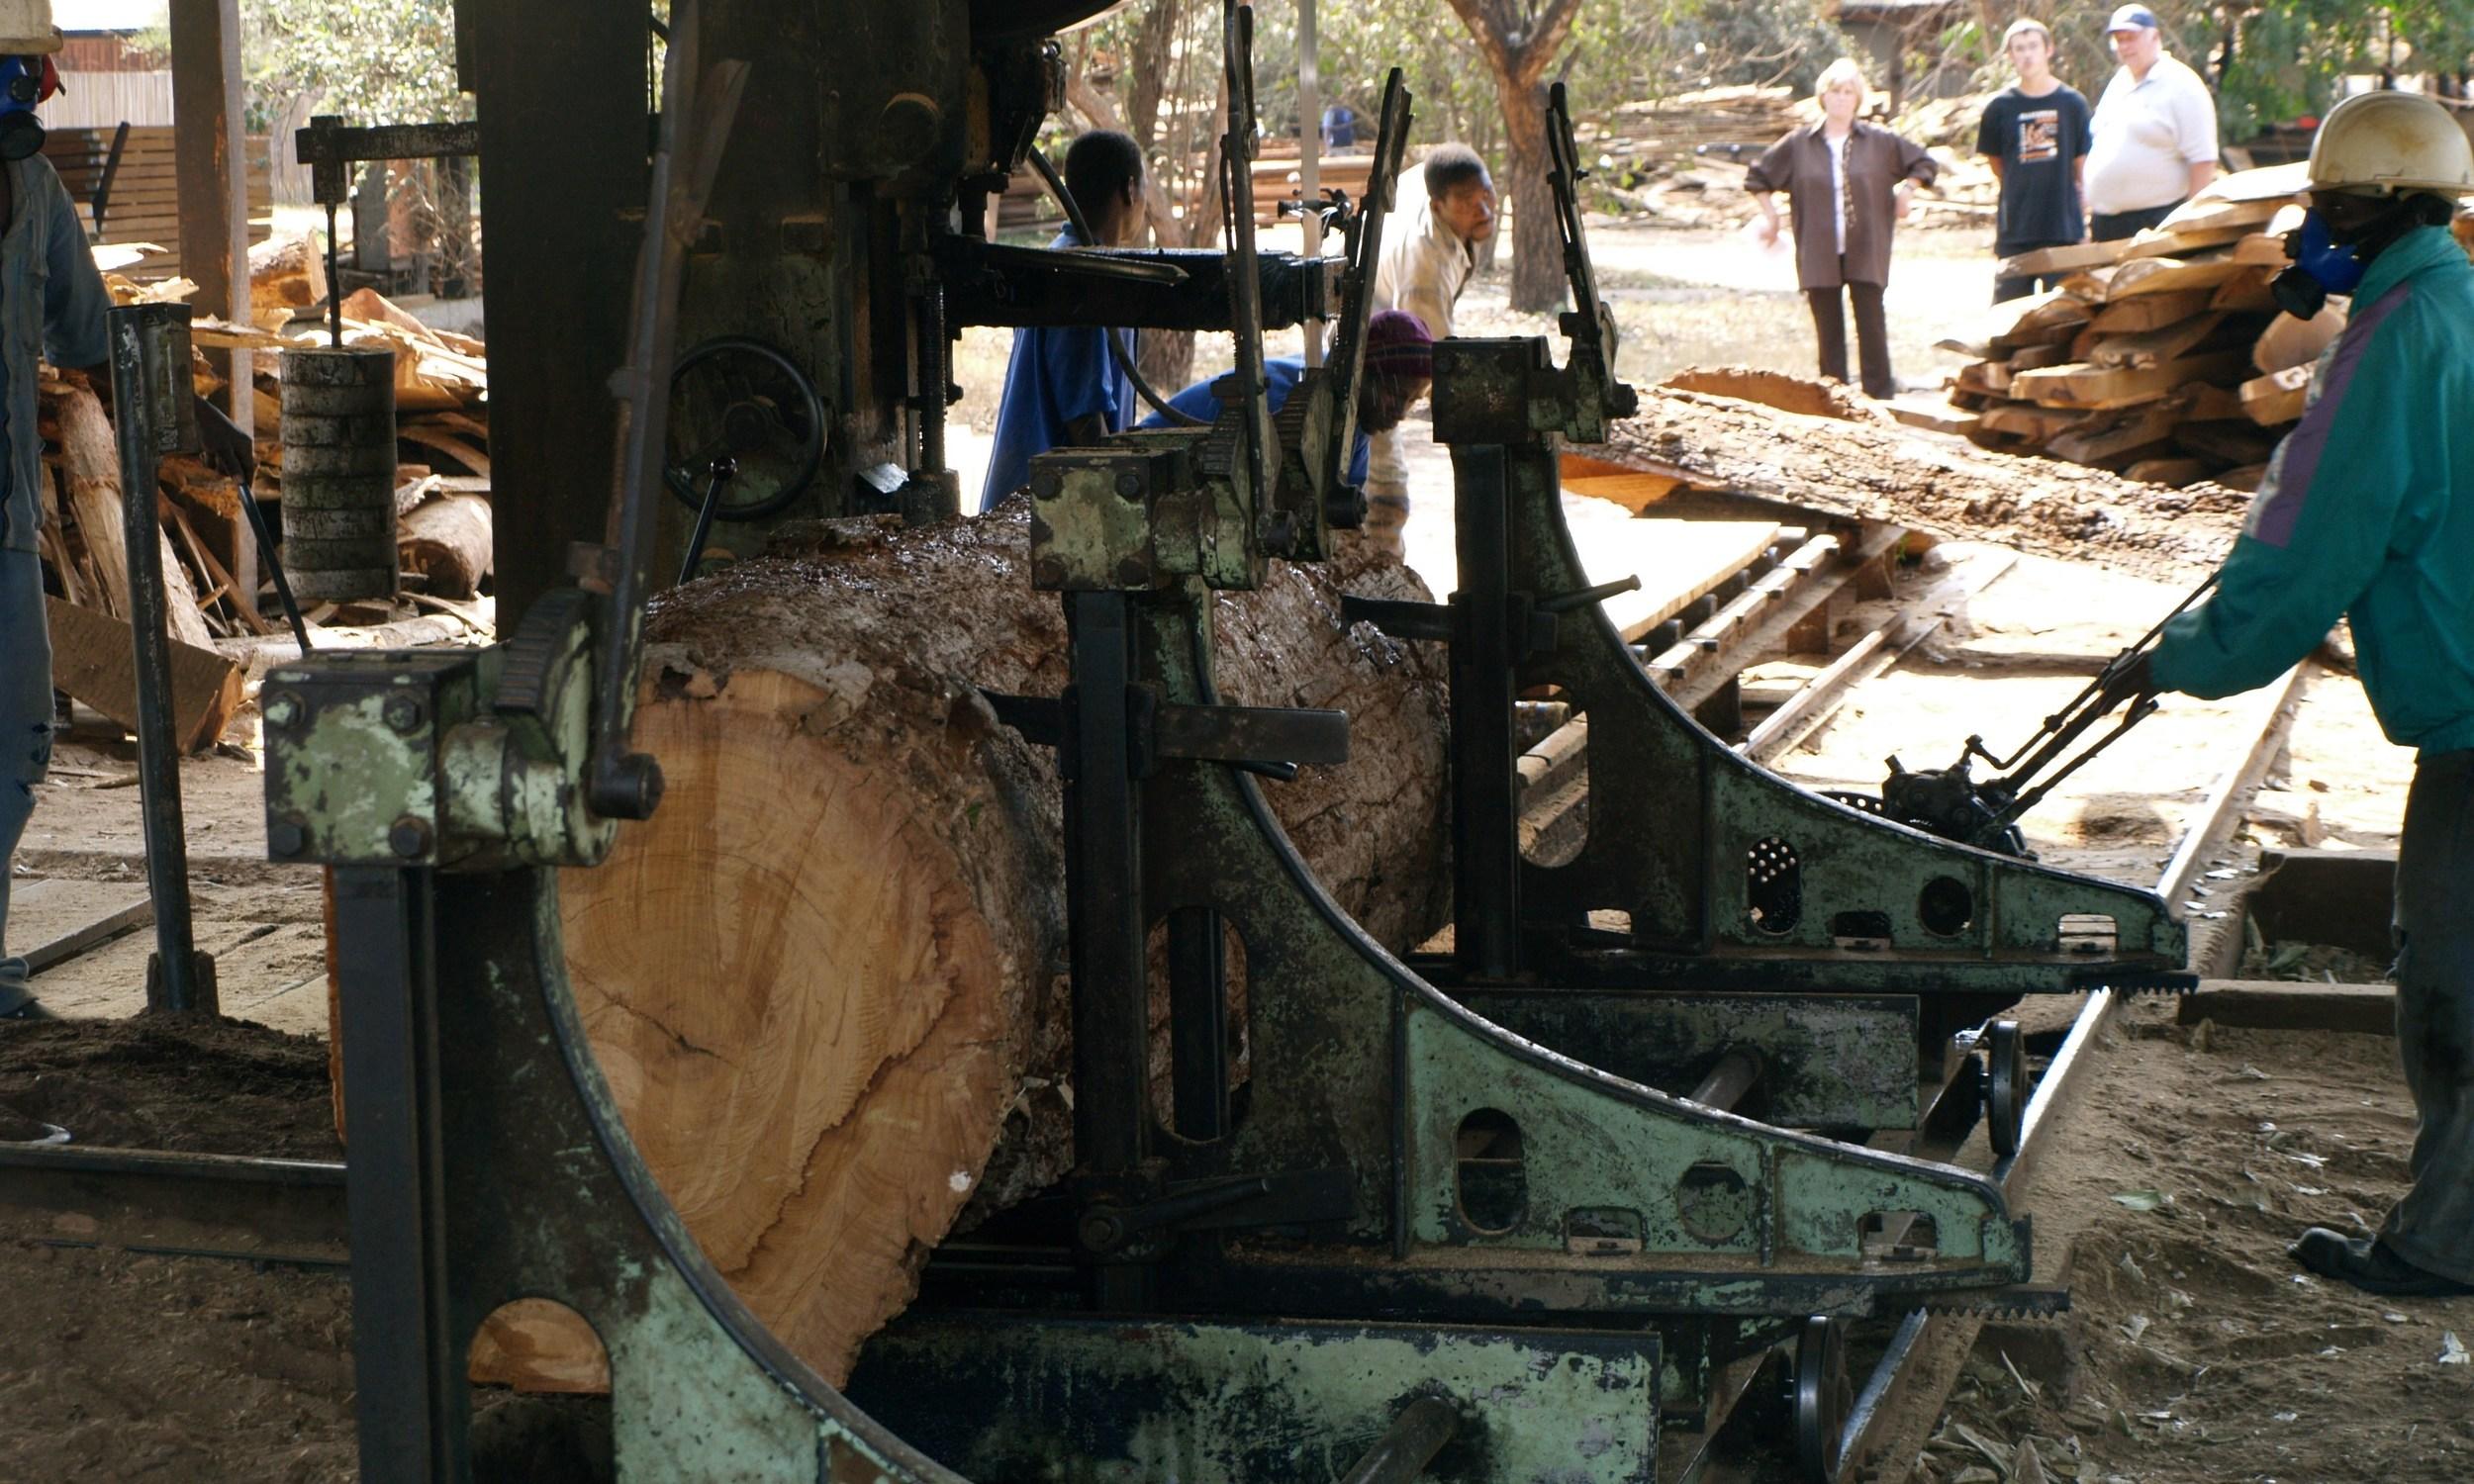 The old faithful - the Pinheiro breakdown saw - 1 of 2 units